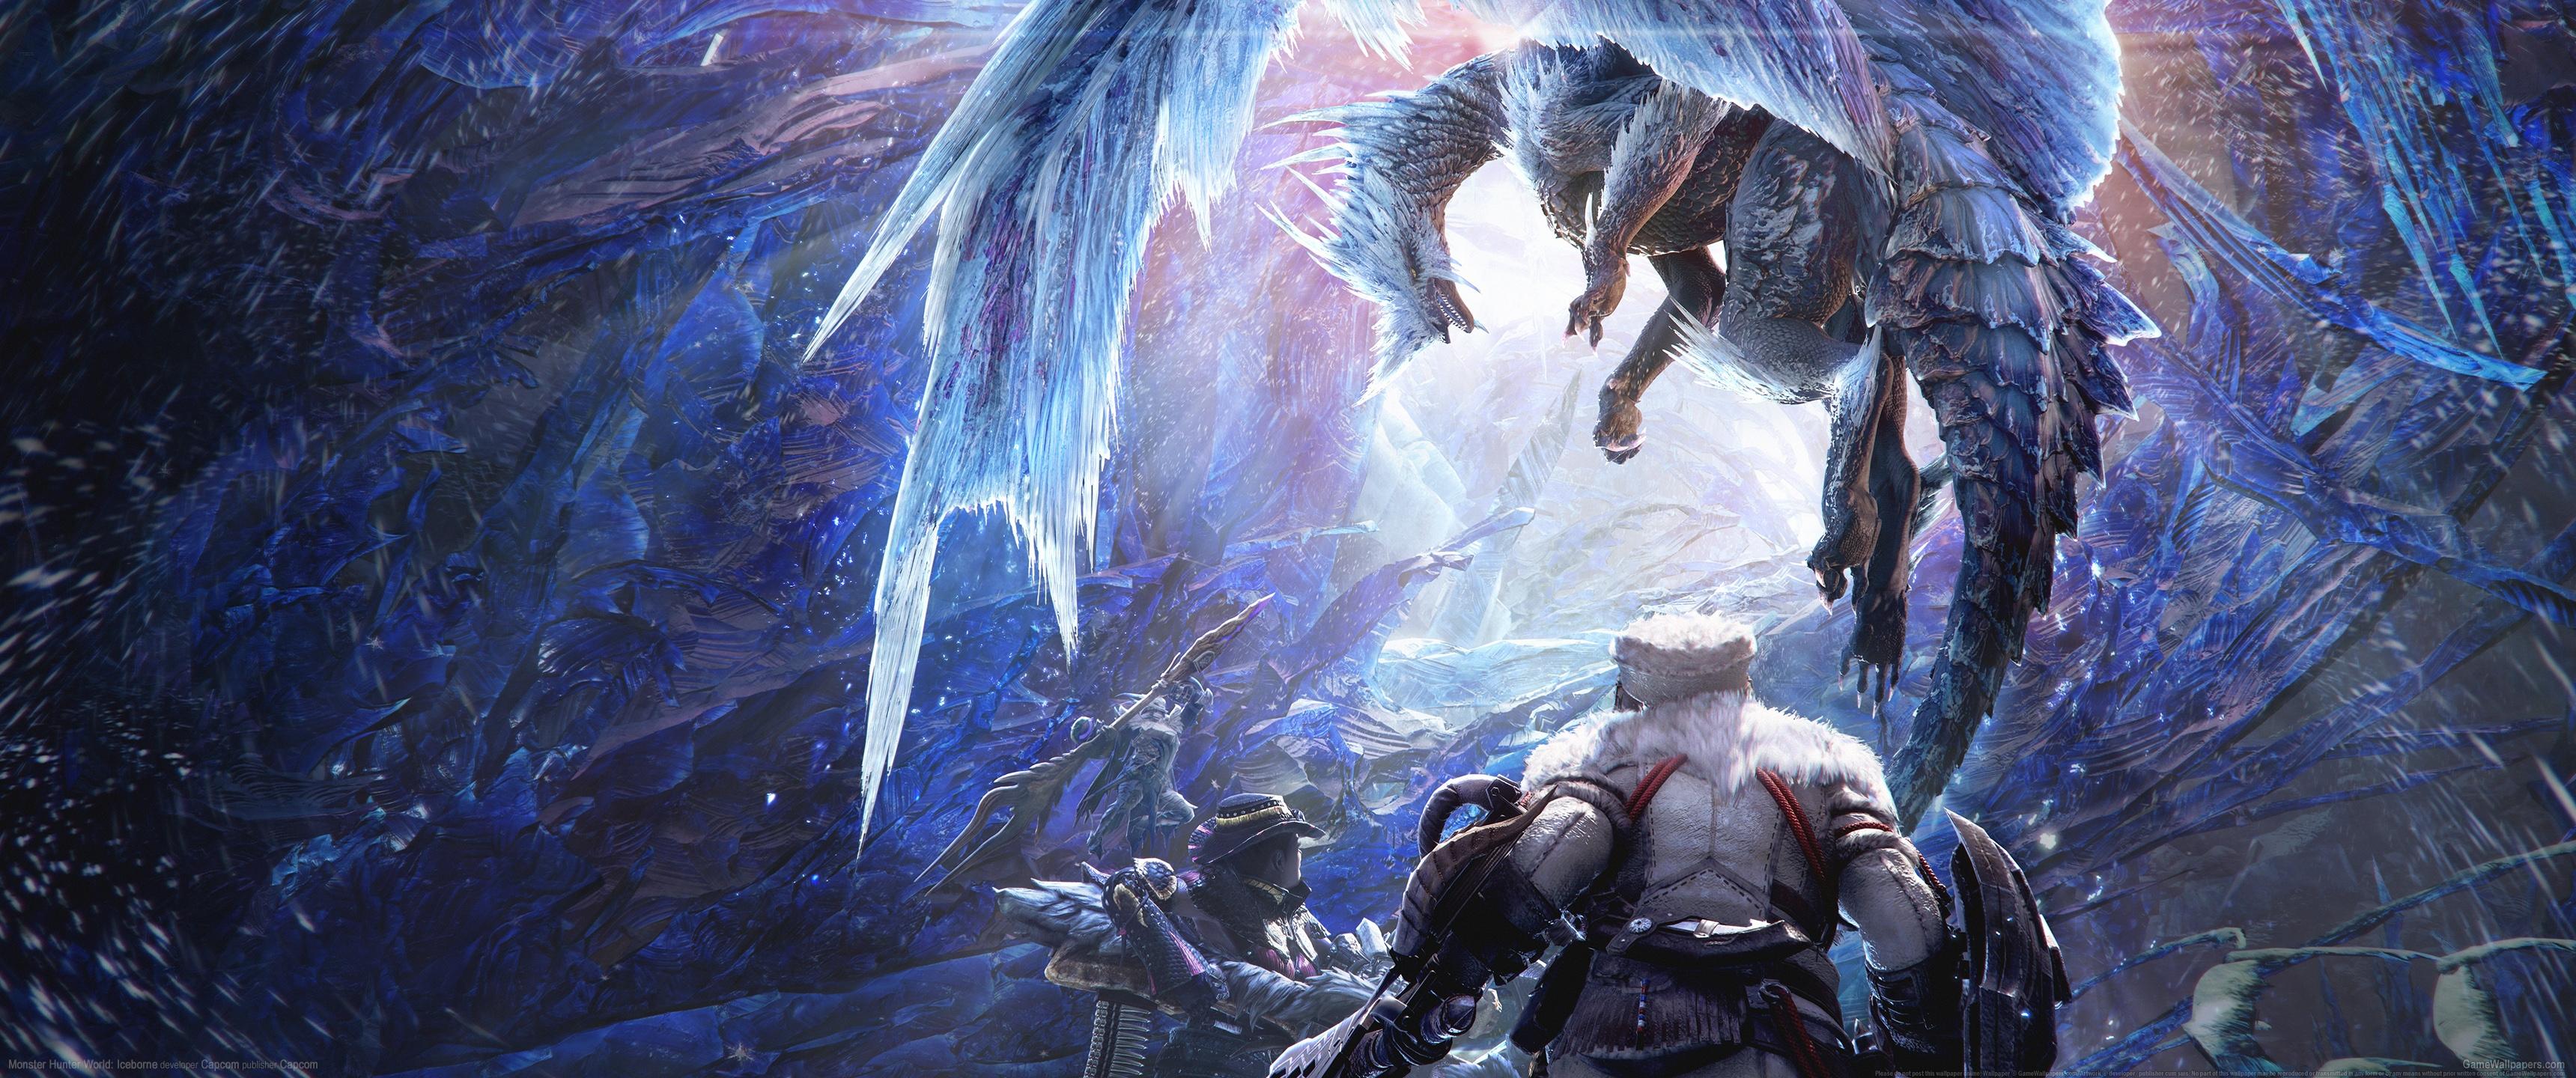 General 3440x1440 video games video game art ultrawide ultra-wide Monster Hunter: World